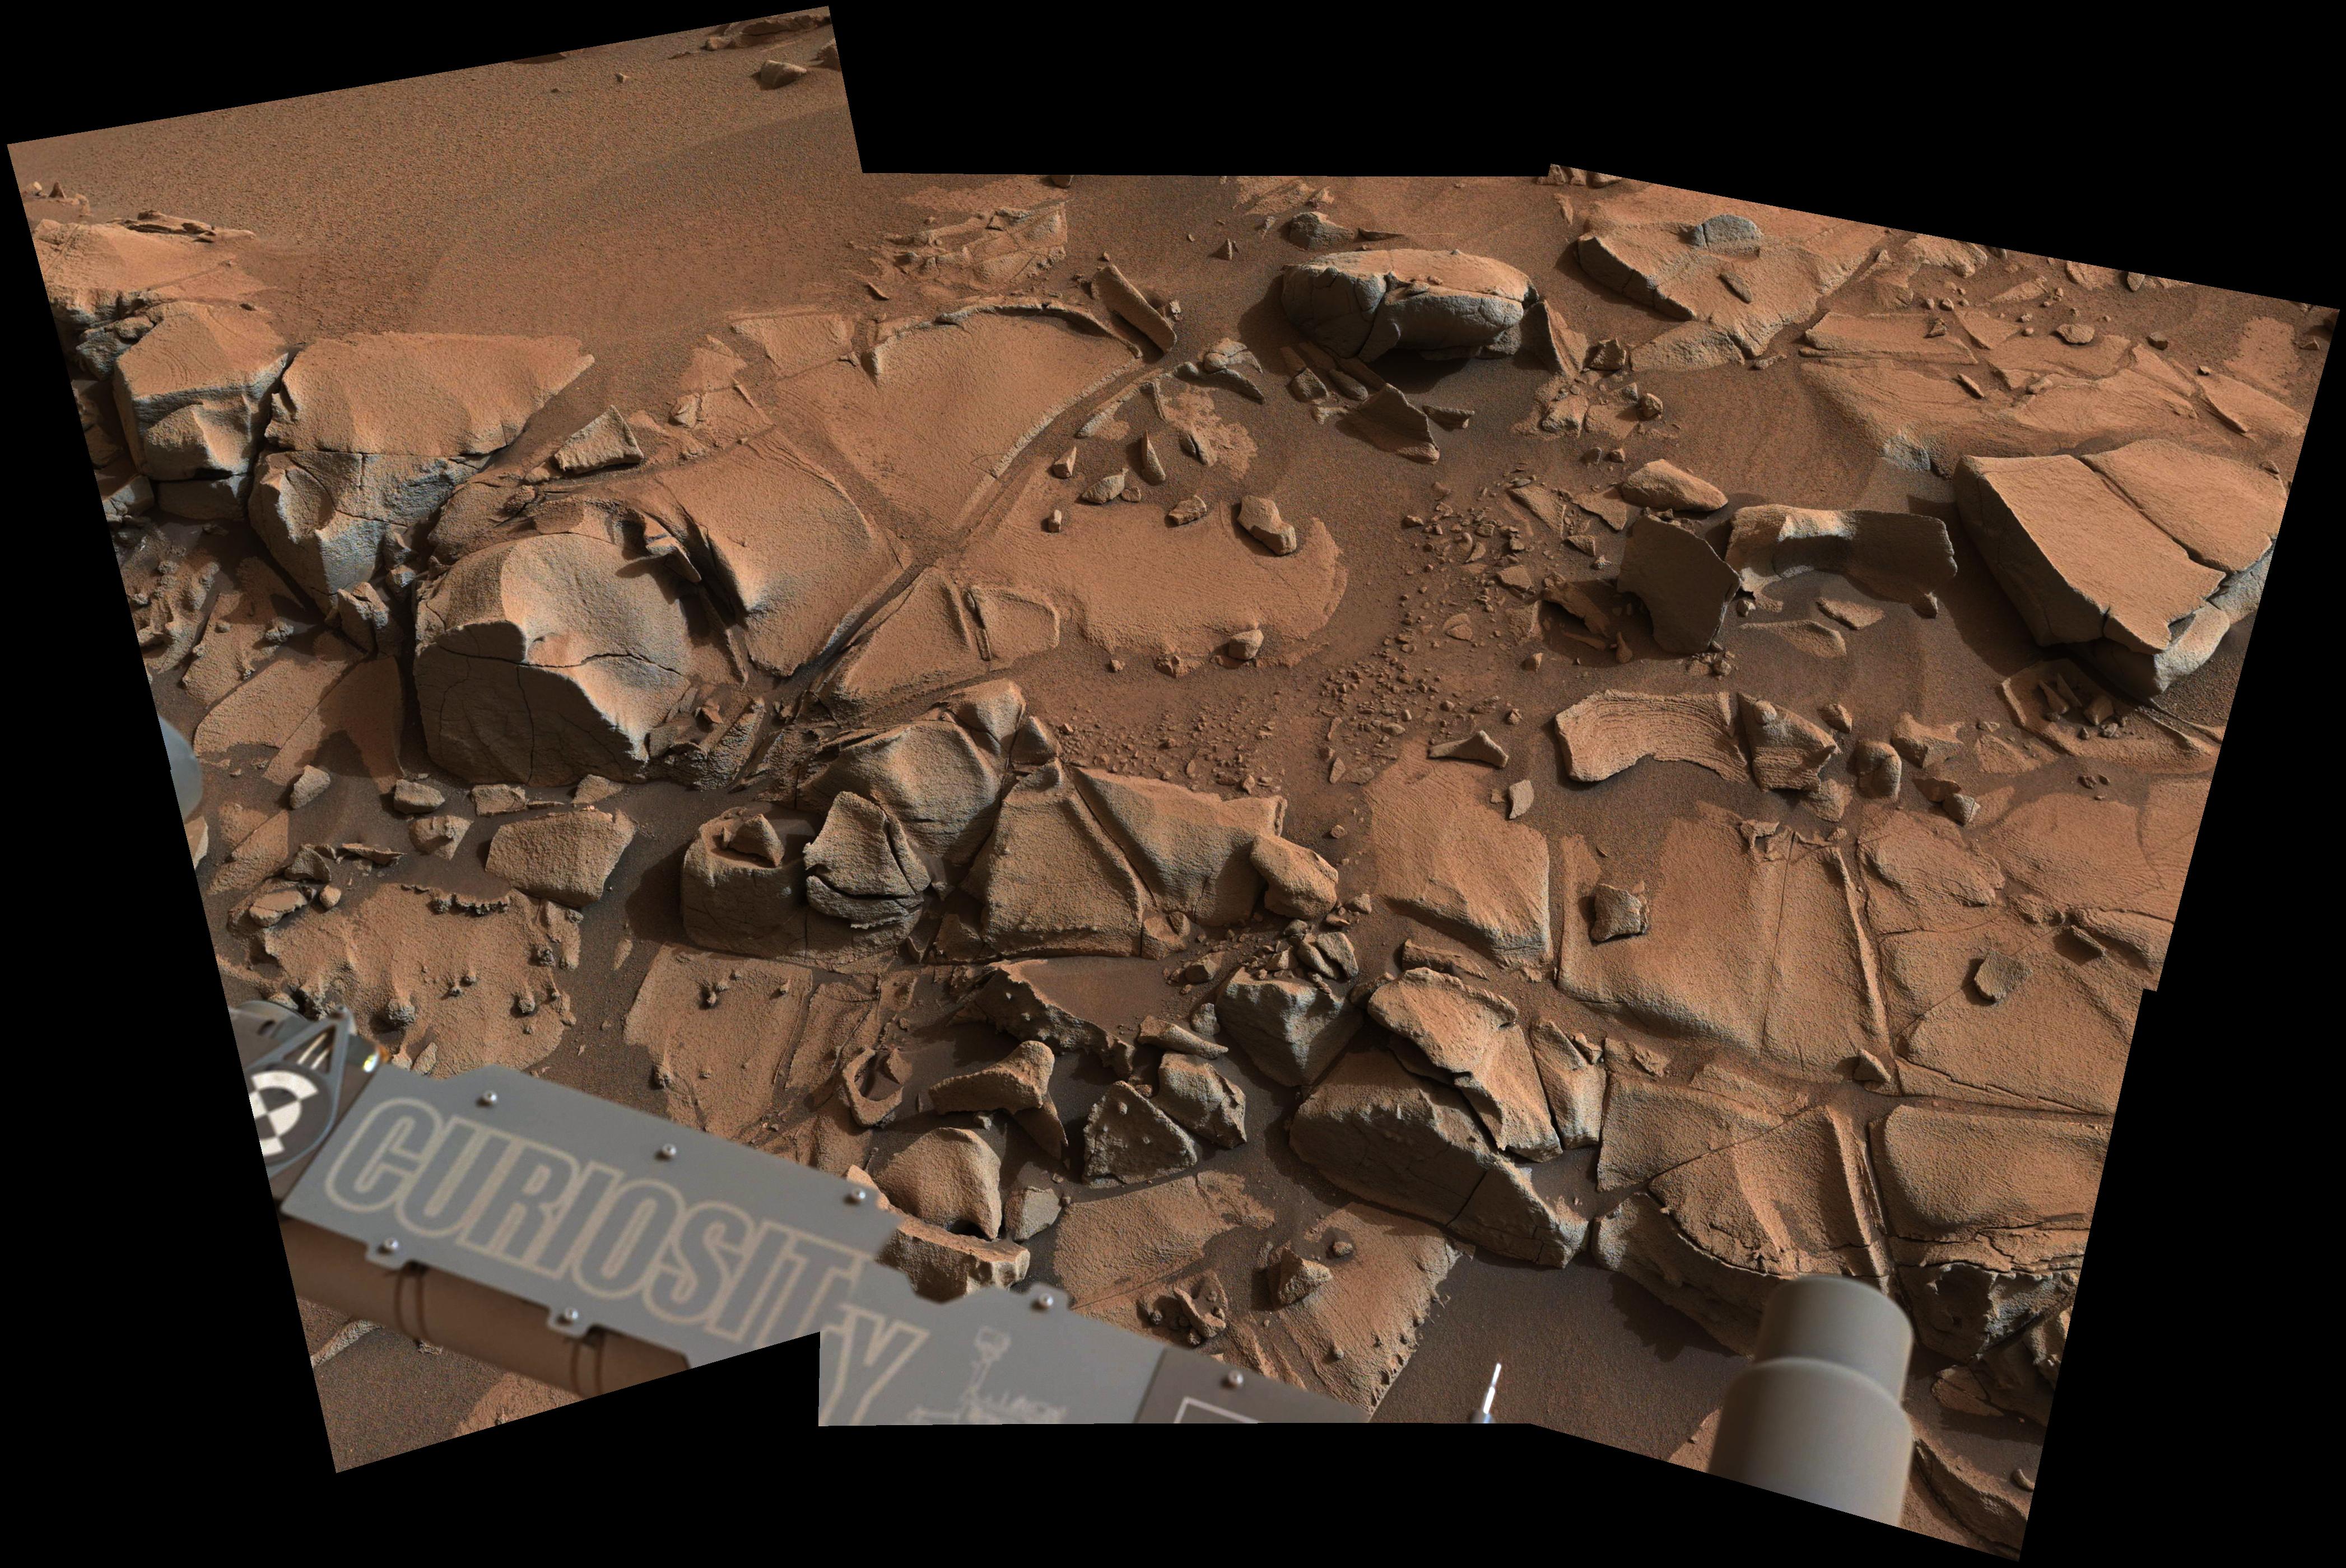 Mars-Rover-Curiosity-MastCam-Rock-Alexander-Hills-sol-817-pia19066-full